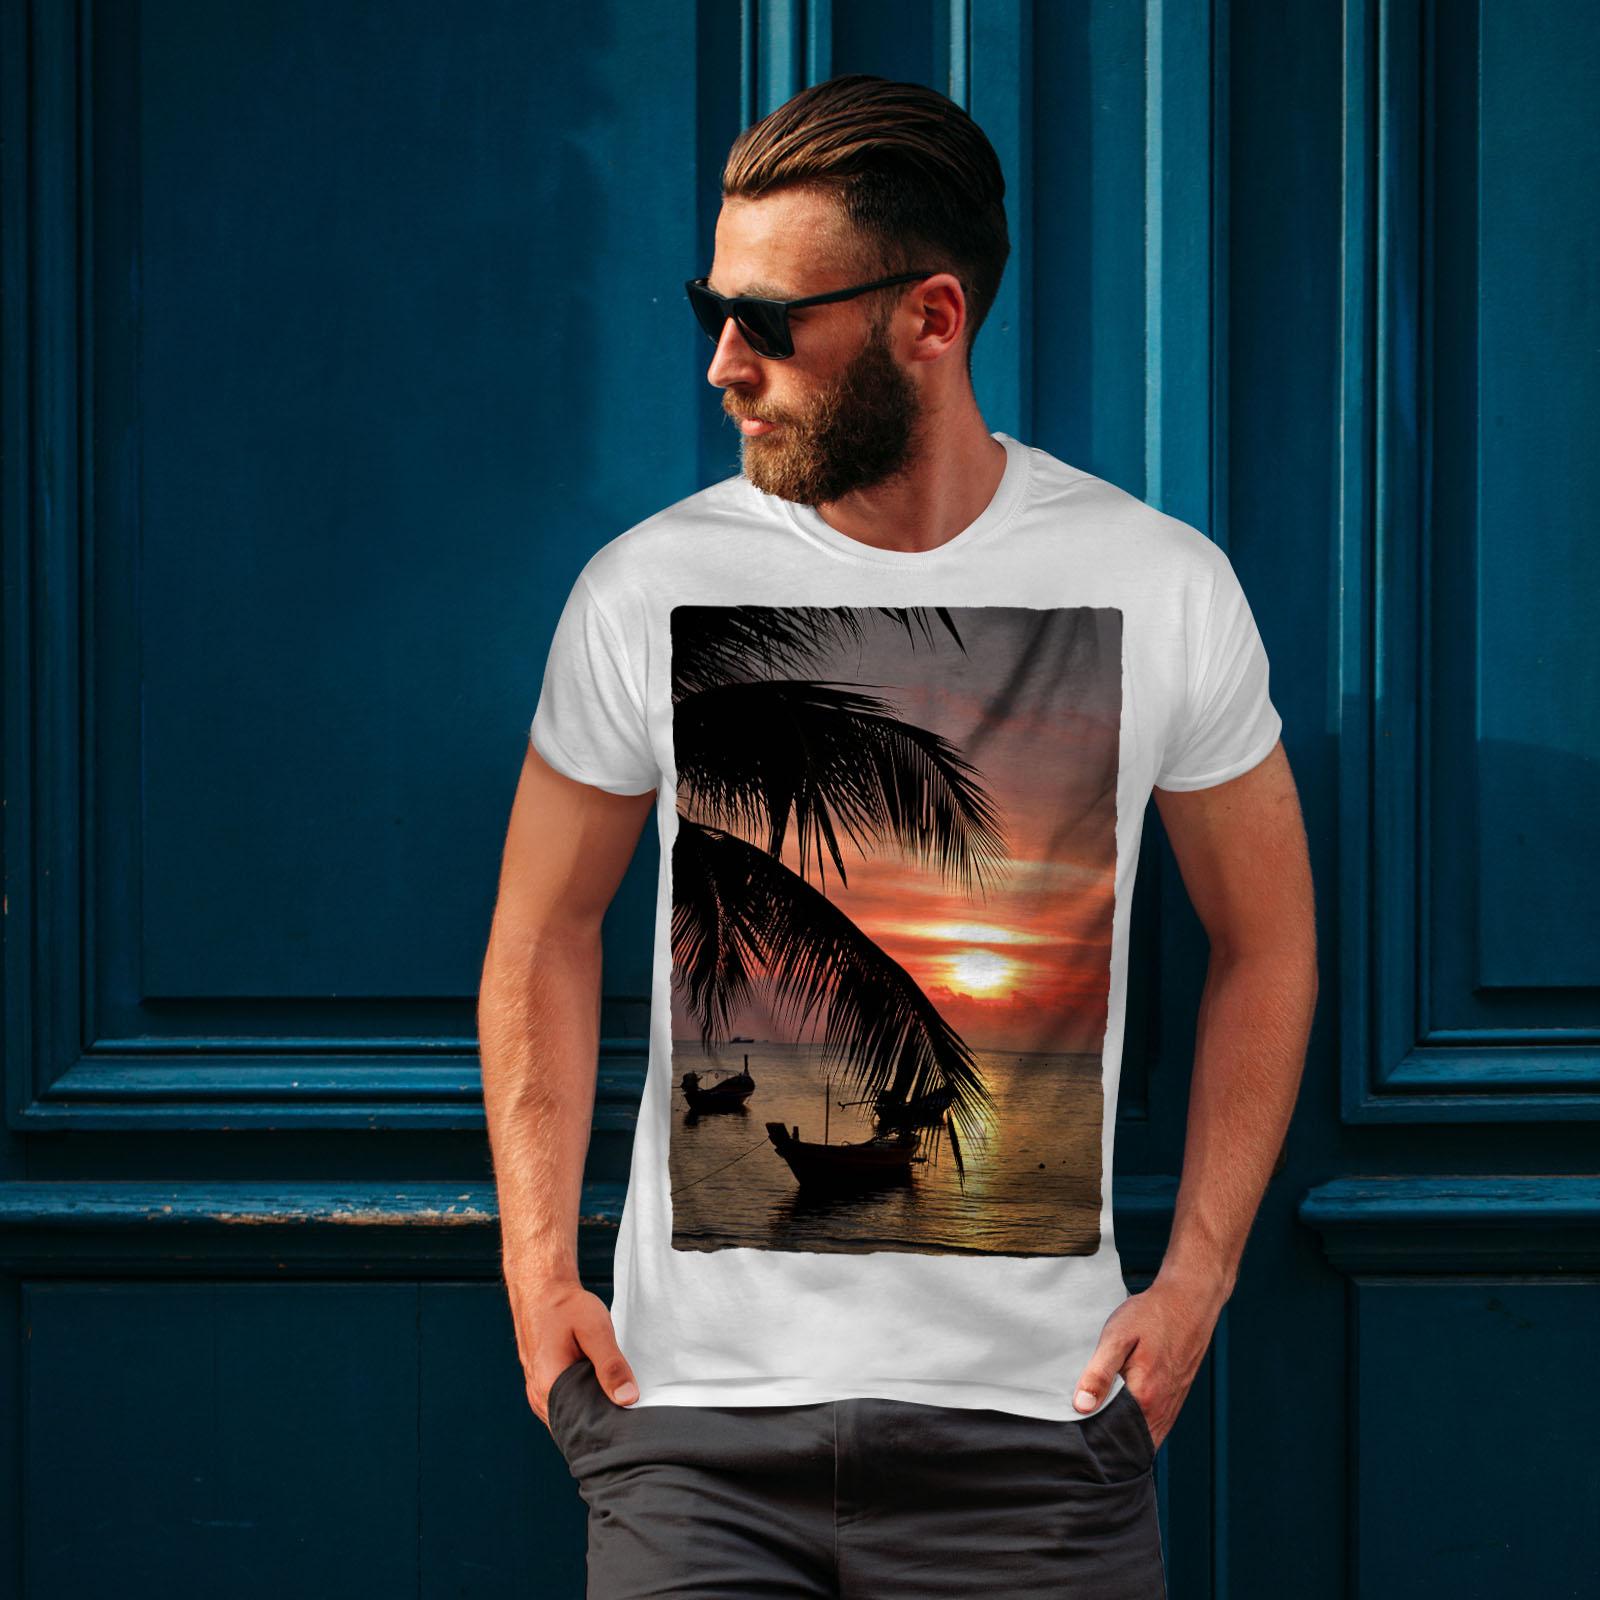 Wellcoda-Sunset-Palm-Tree-Mens-T-shirt-Ocean-Beach-Graphic-Design-Printed-Tee thumbnail 10